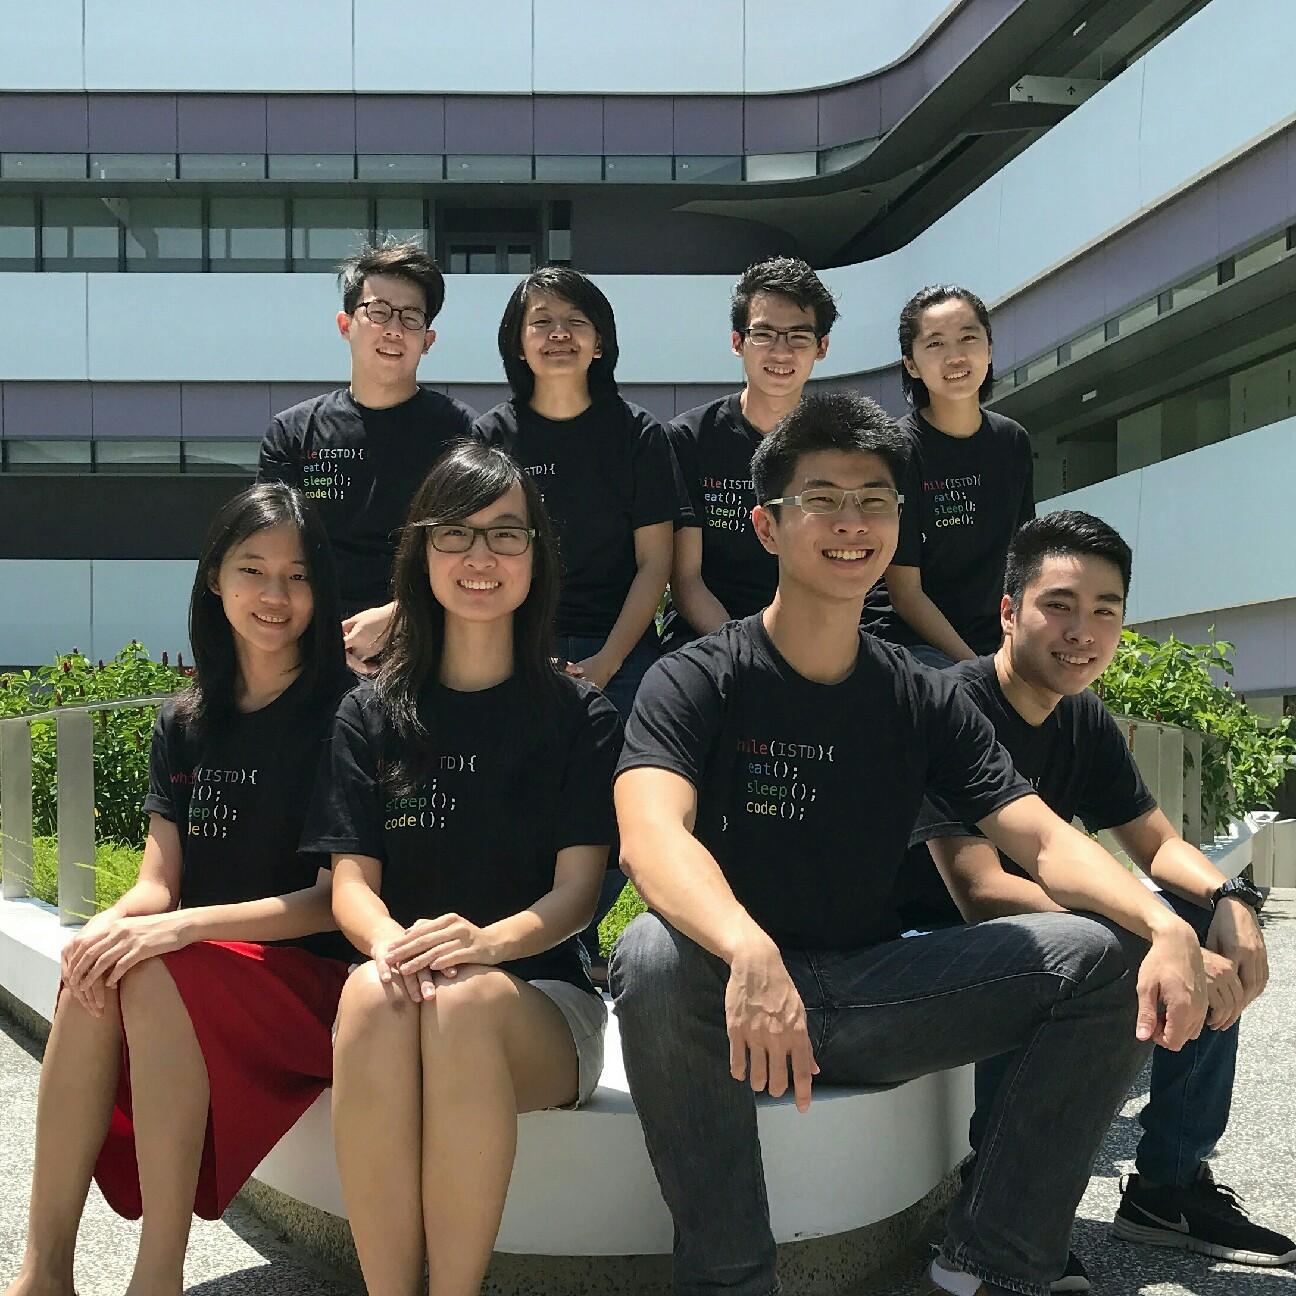 istd-student-board-2017